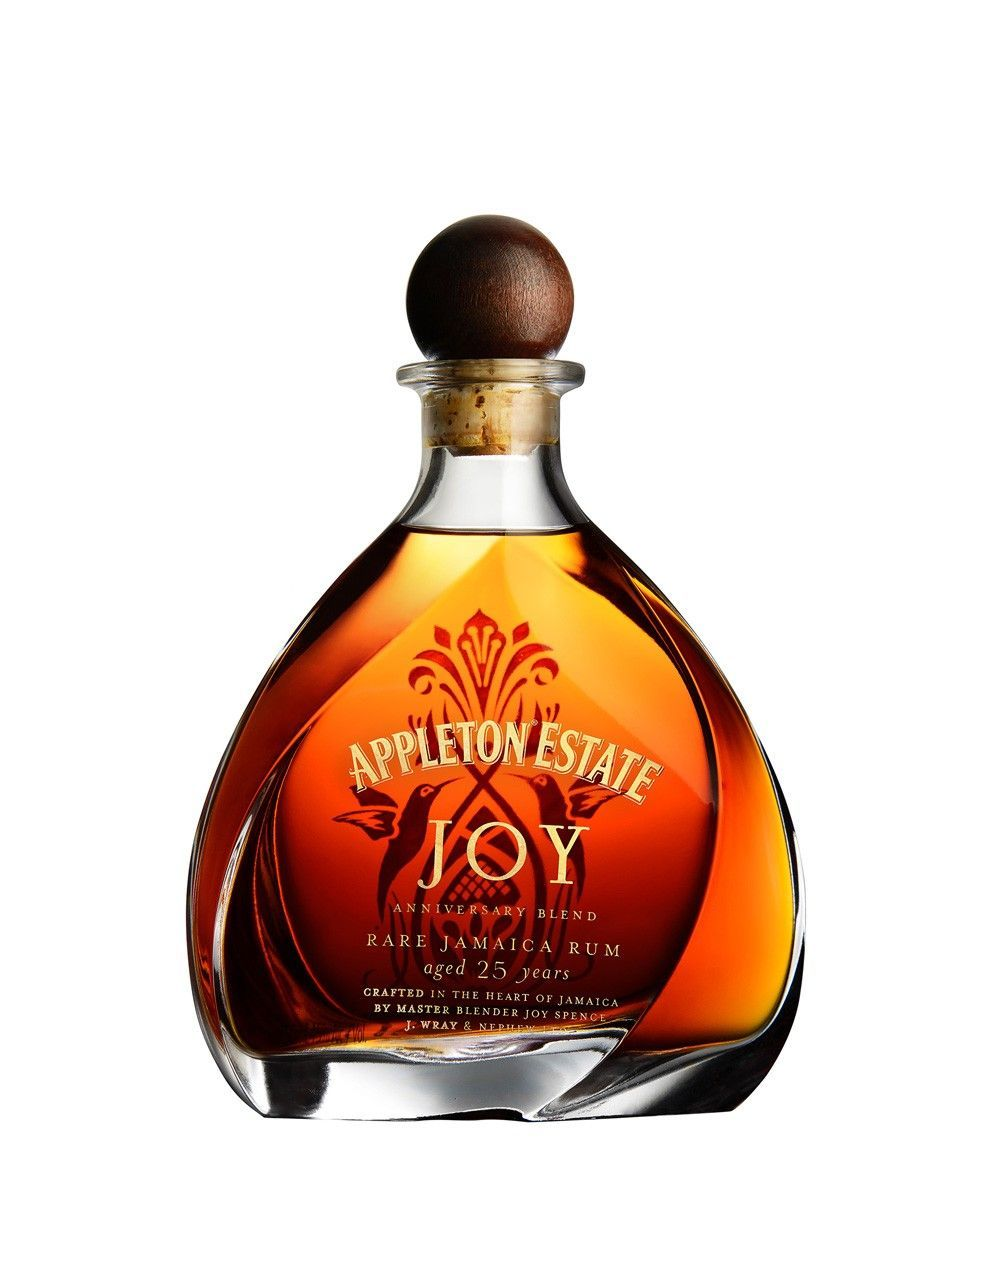 Appleton Estate Joy Anniversary Blend Appleton Estate Rum Aged Rum